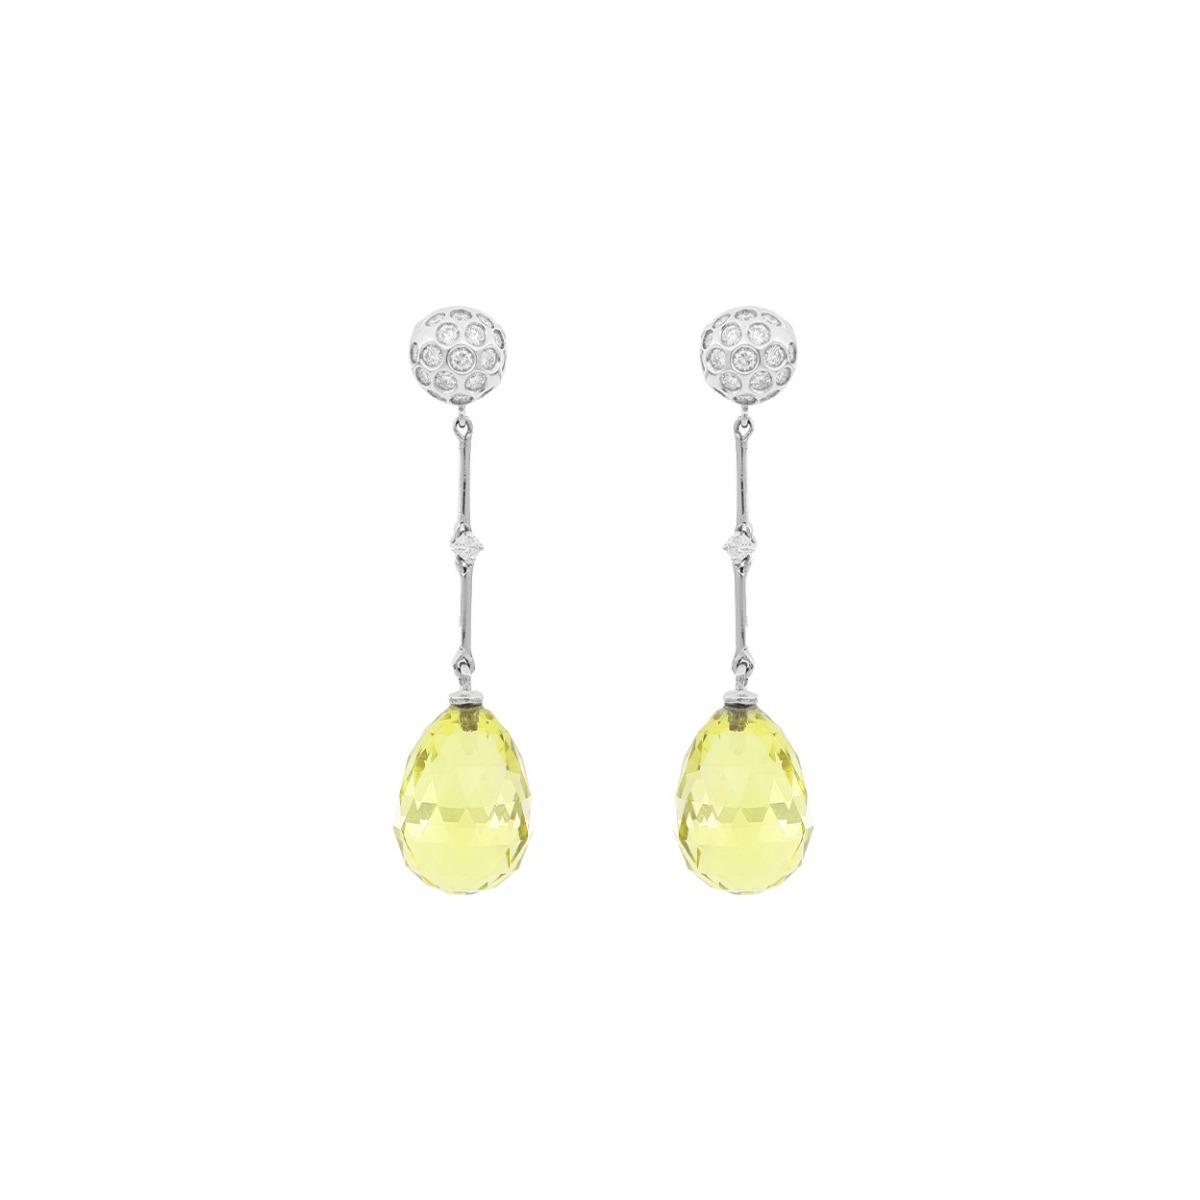 Lemon Quartz Drop Earrings with Diamonds